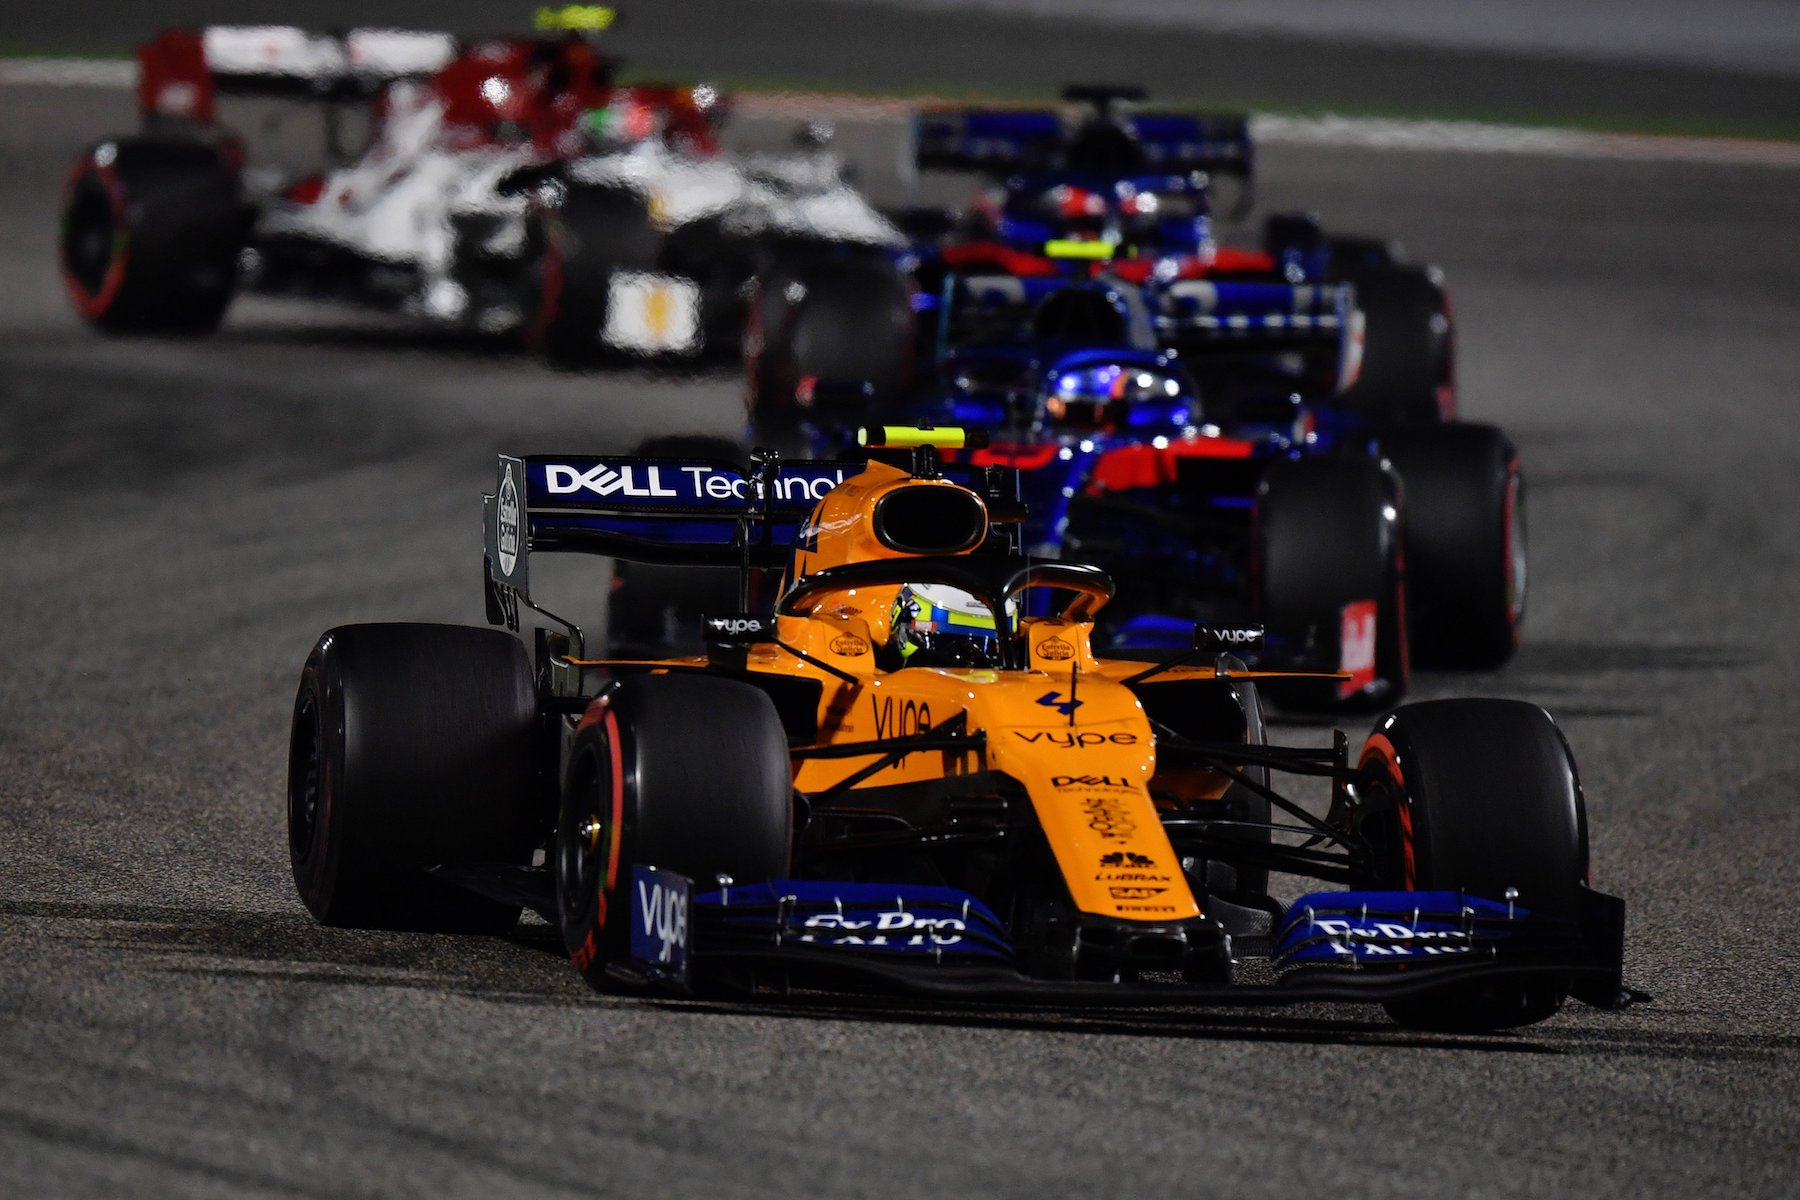 3 6 8 2019 Lando Norris | McLaren MCL34 | 2019 Bahrain GP 1 copy.jpg